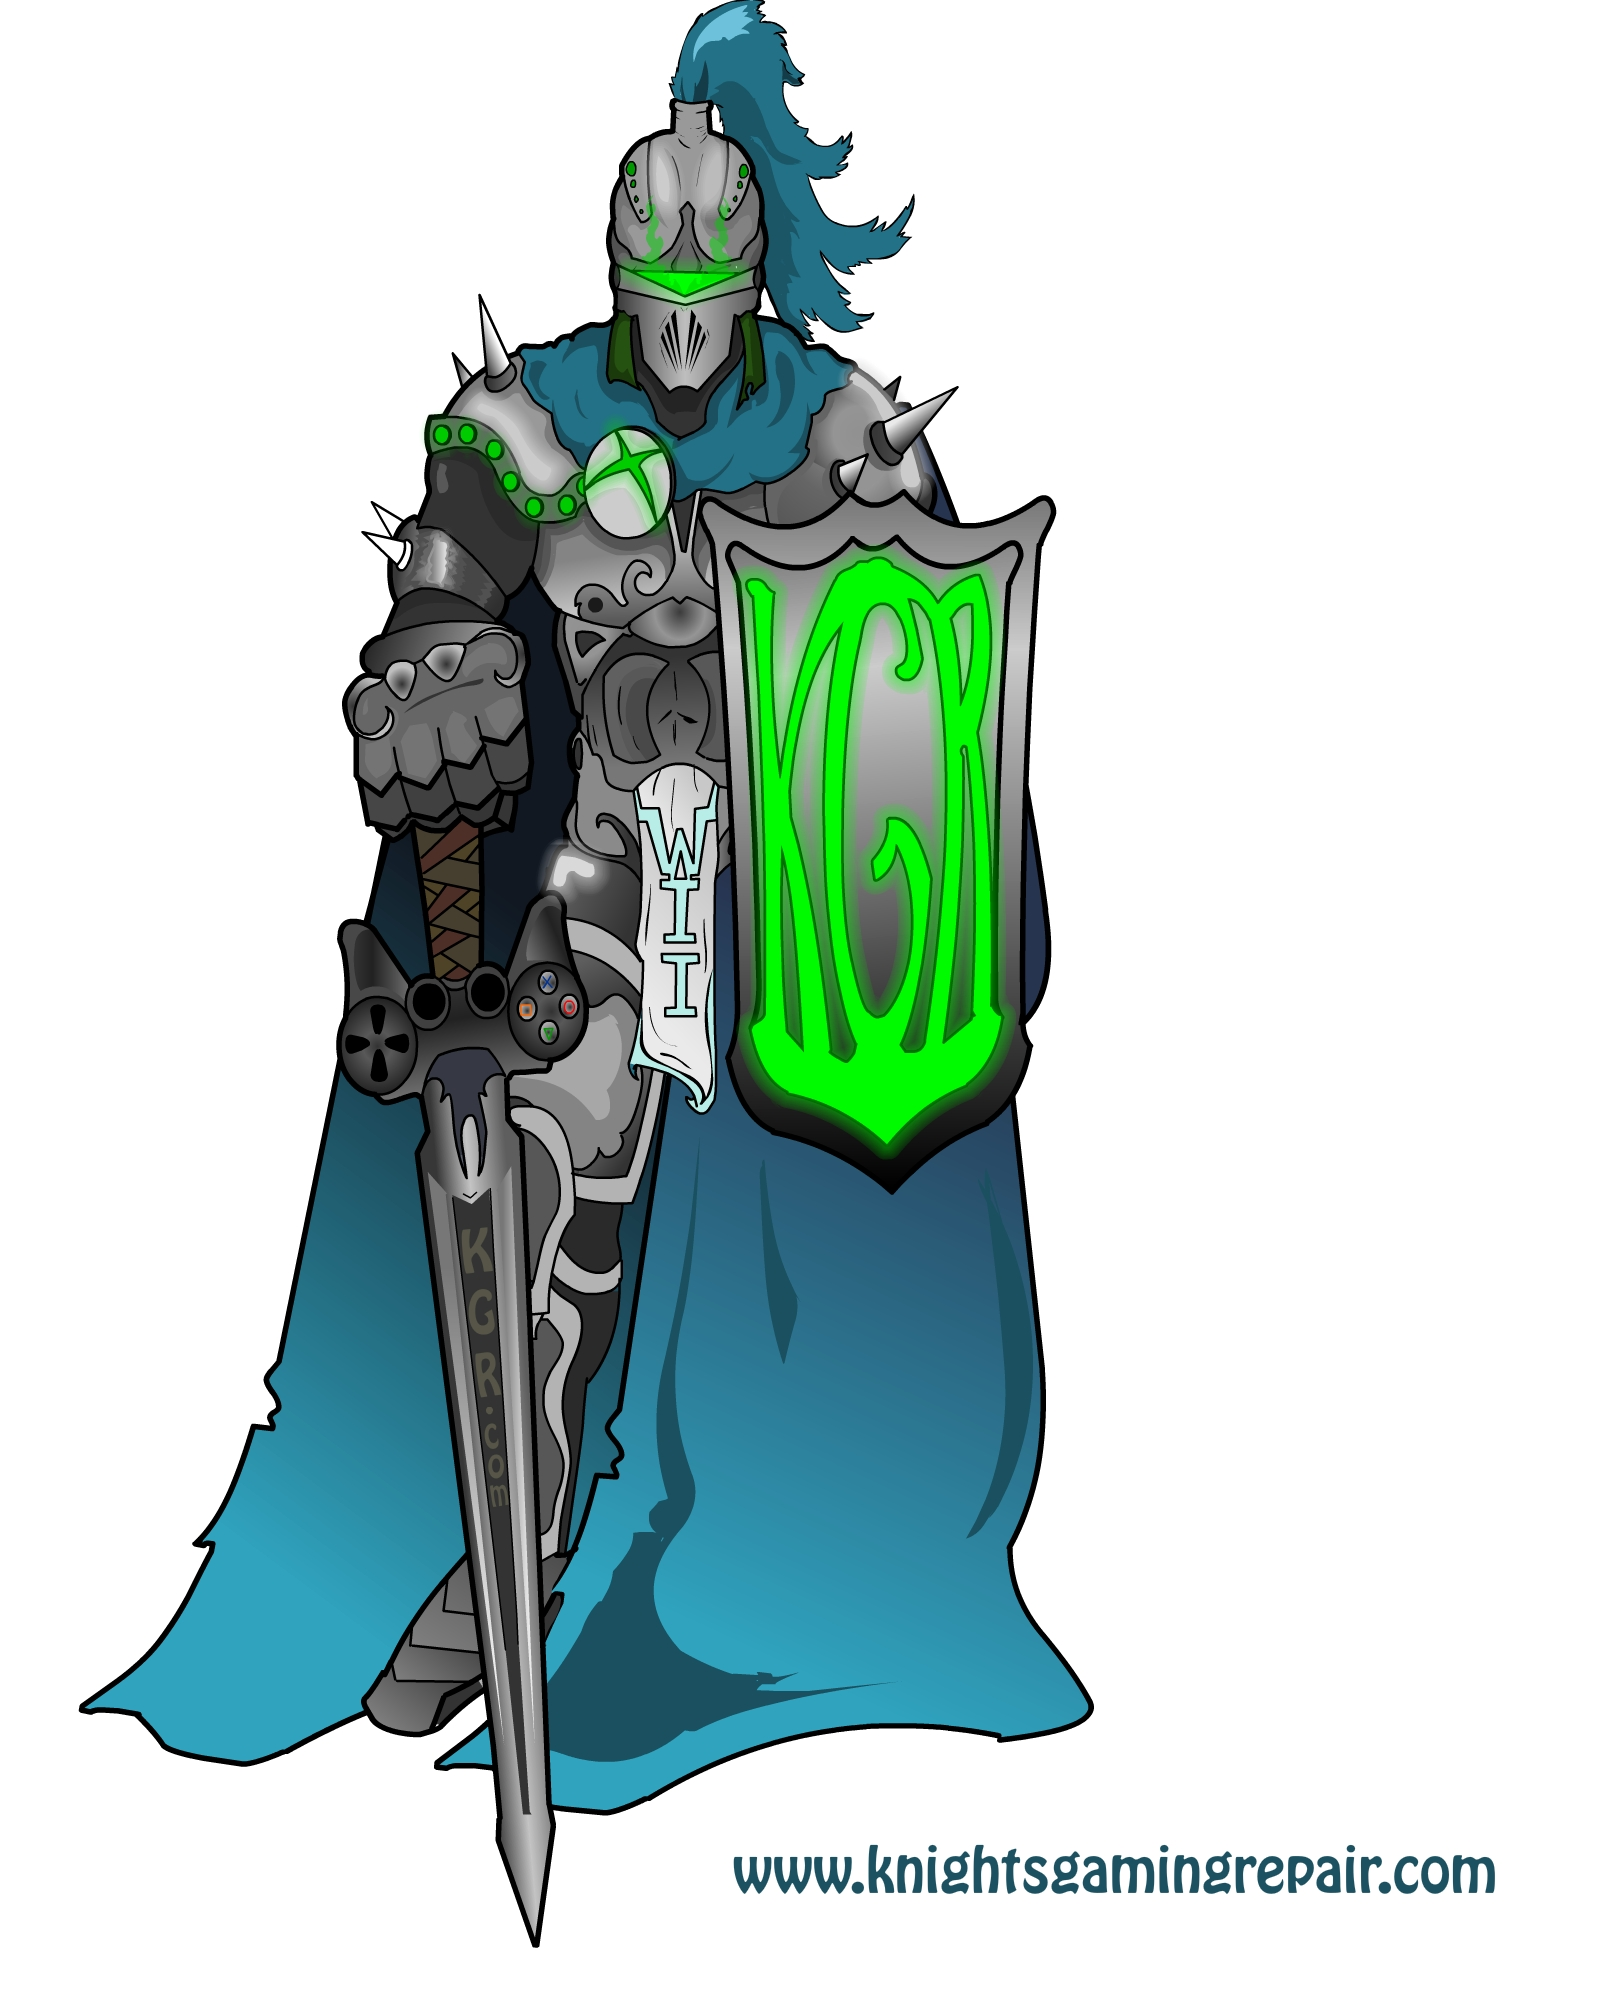 Knights Gaming Repair